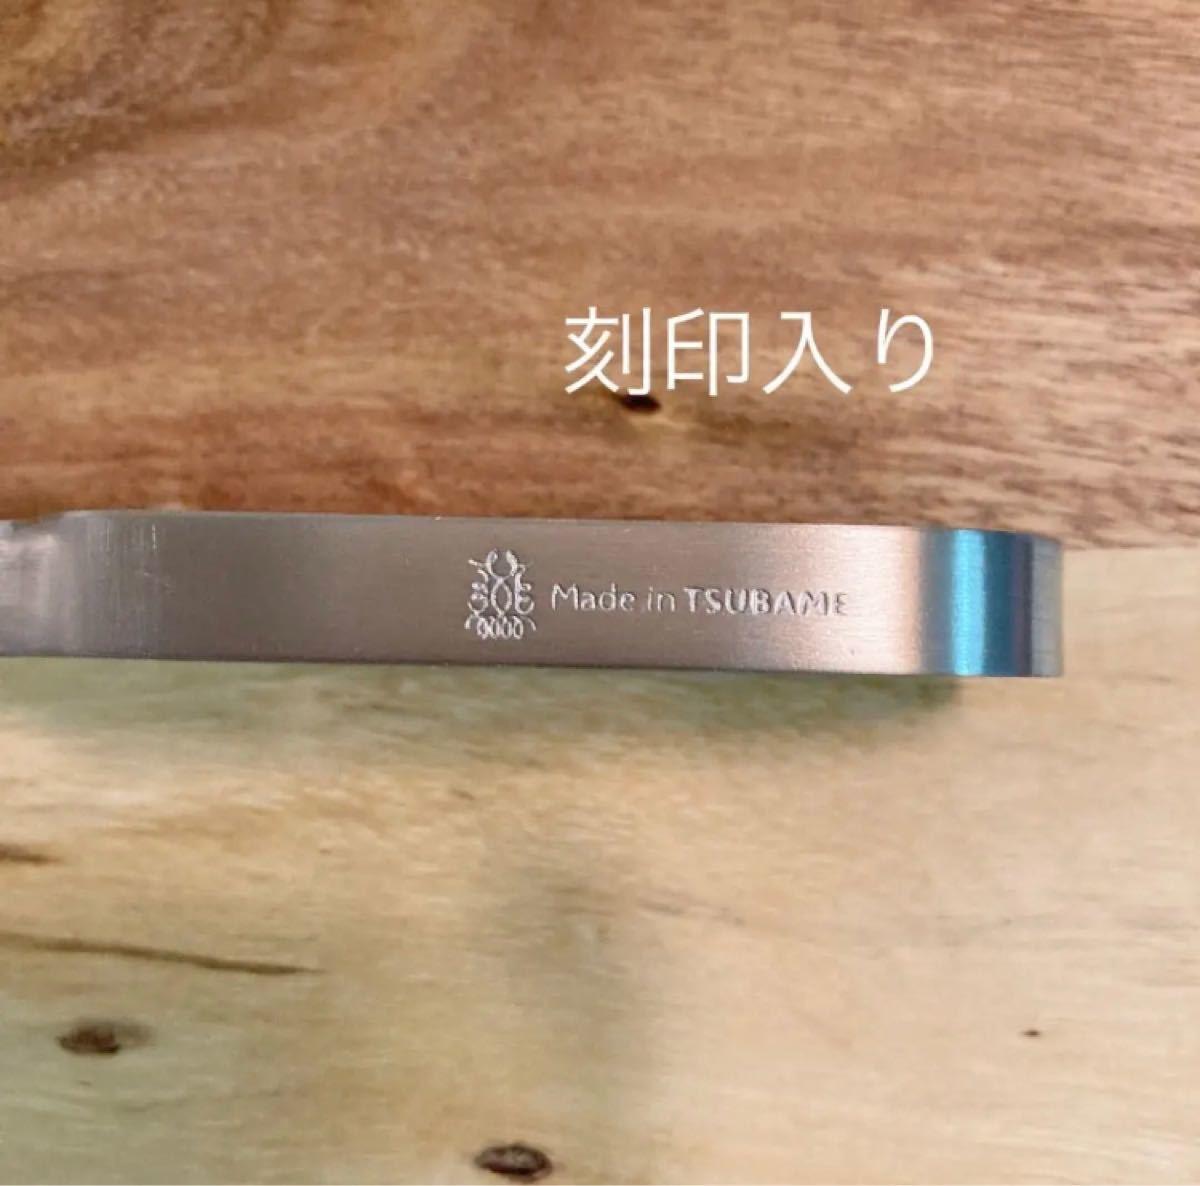 MADE in TSUBAMEステンレスピーラー 新品 日本製 新潟県燕市燕三条 刻印入り 調理器具